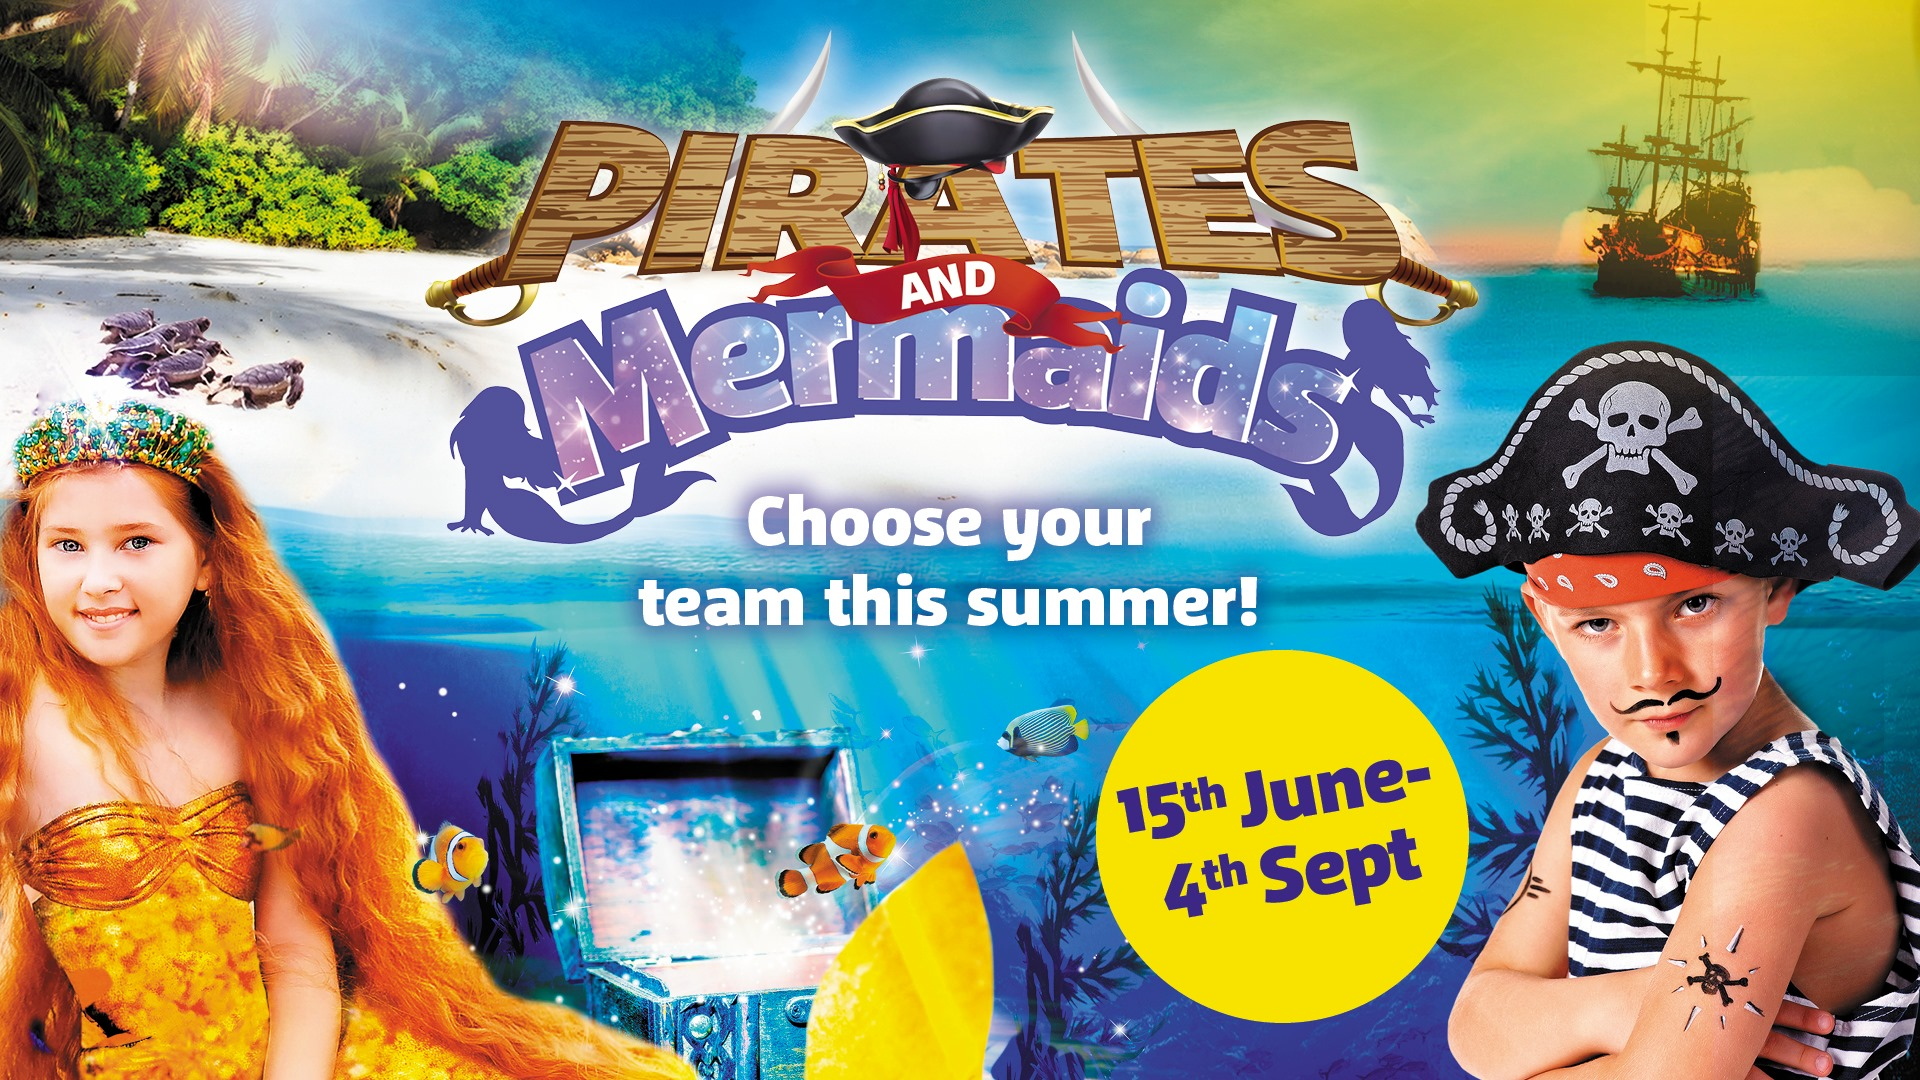 Pirates & Mermaids At Weymouth SEA LIFE Adventure Park